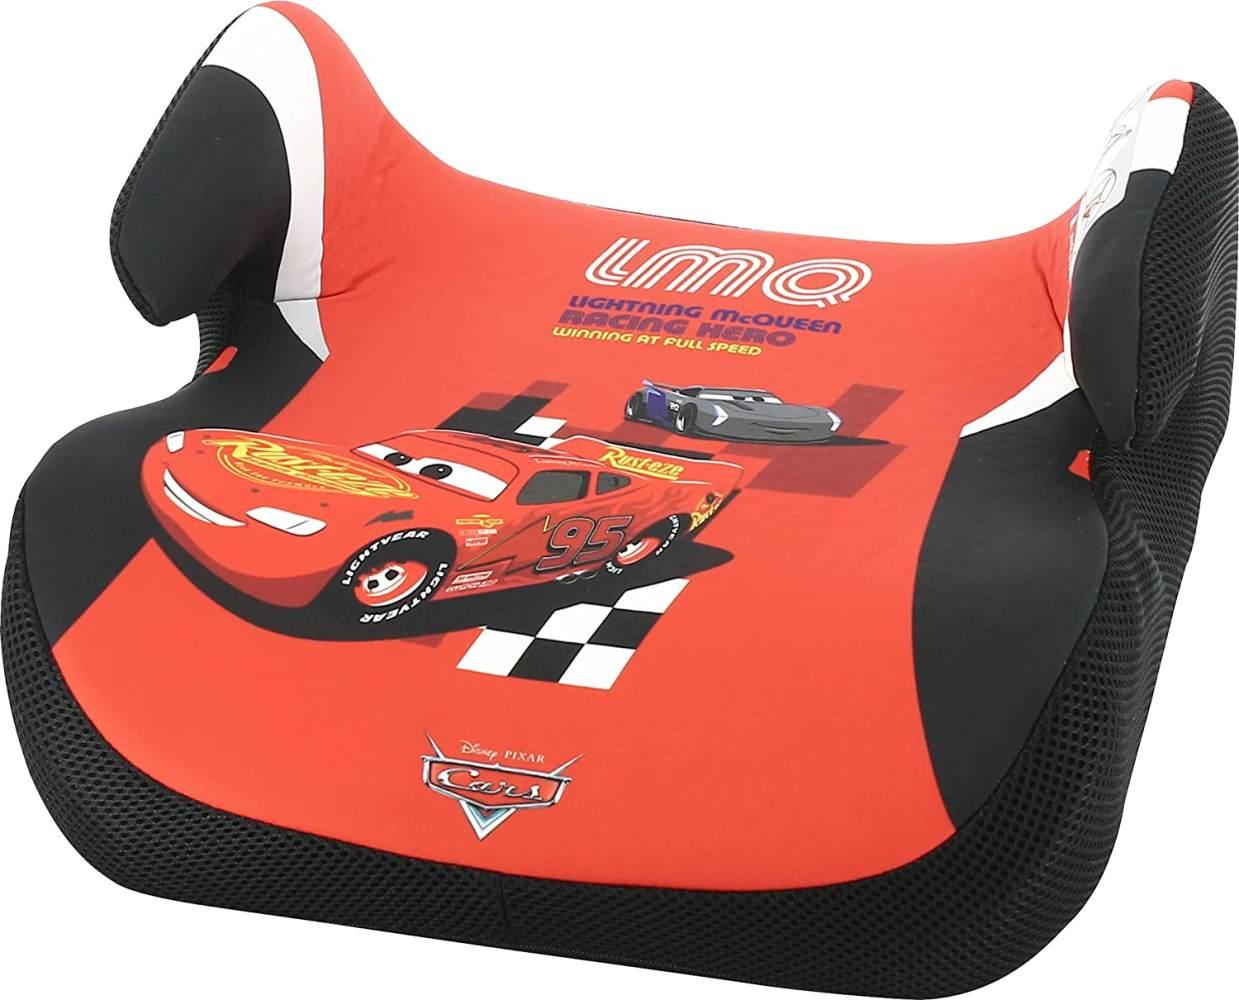 Osann 'Topo Luxe' Sitzerhöhung Cars Bild 1